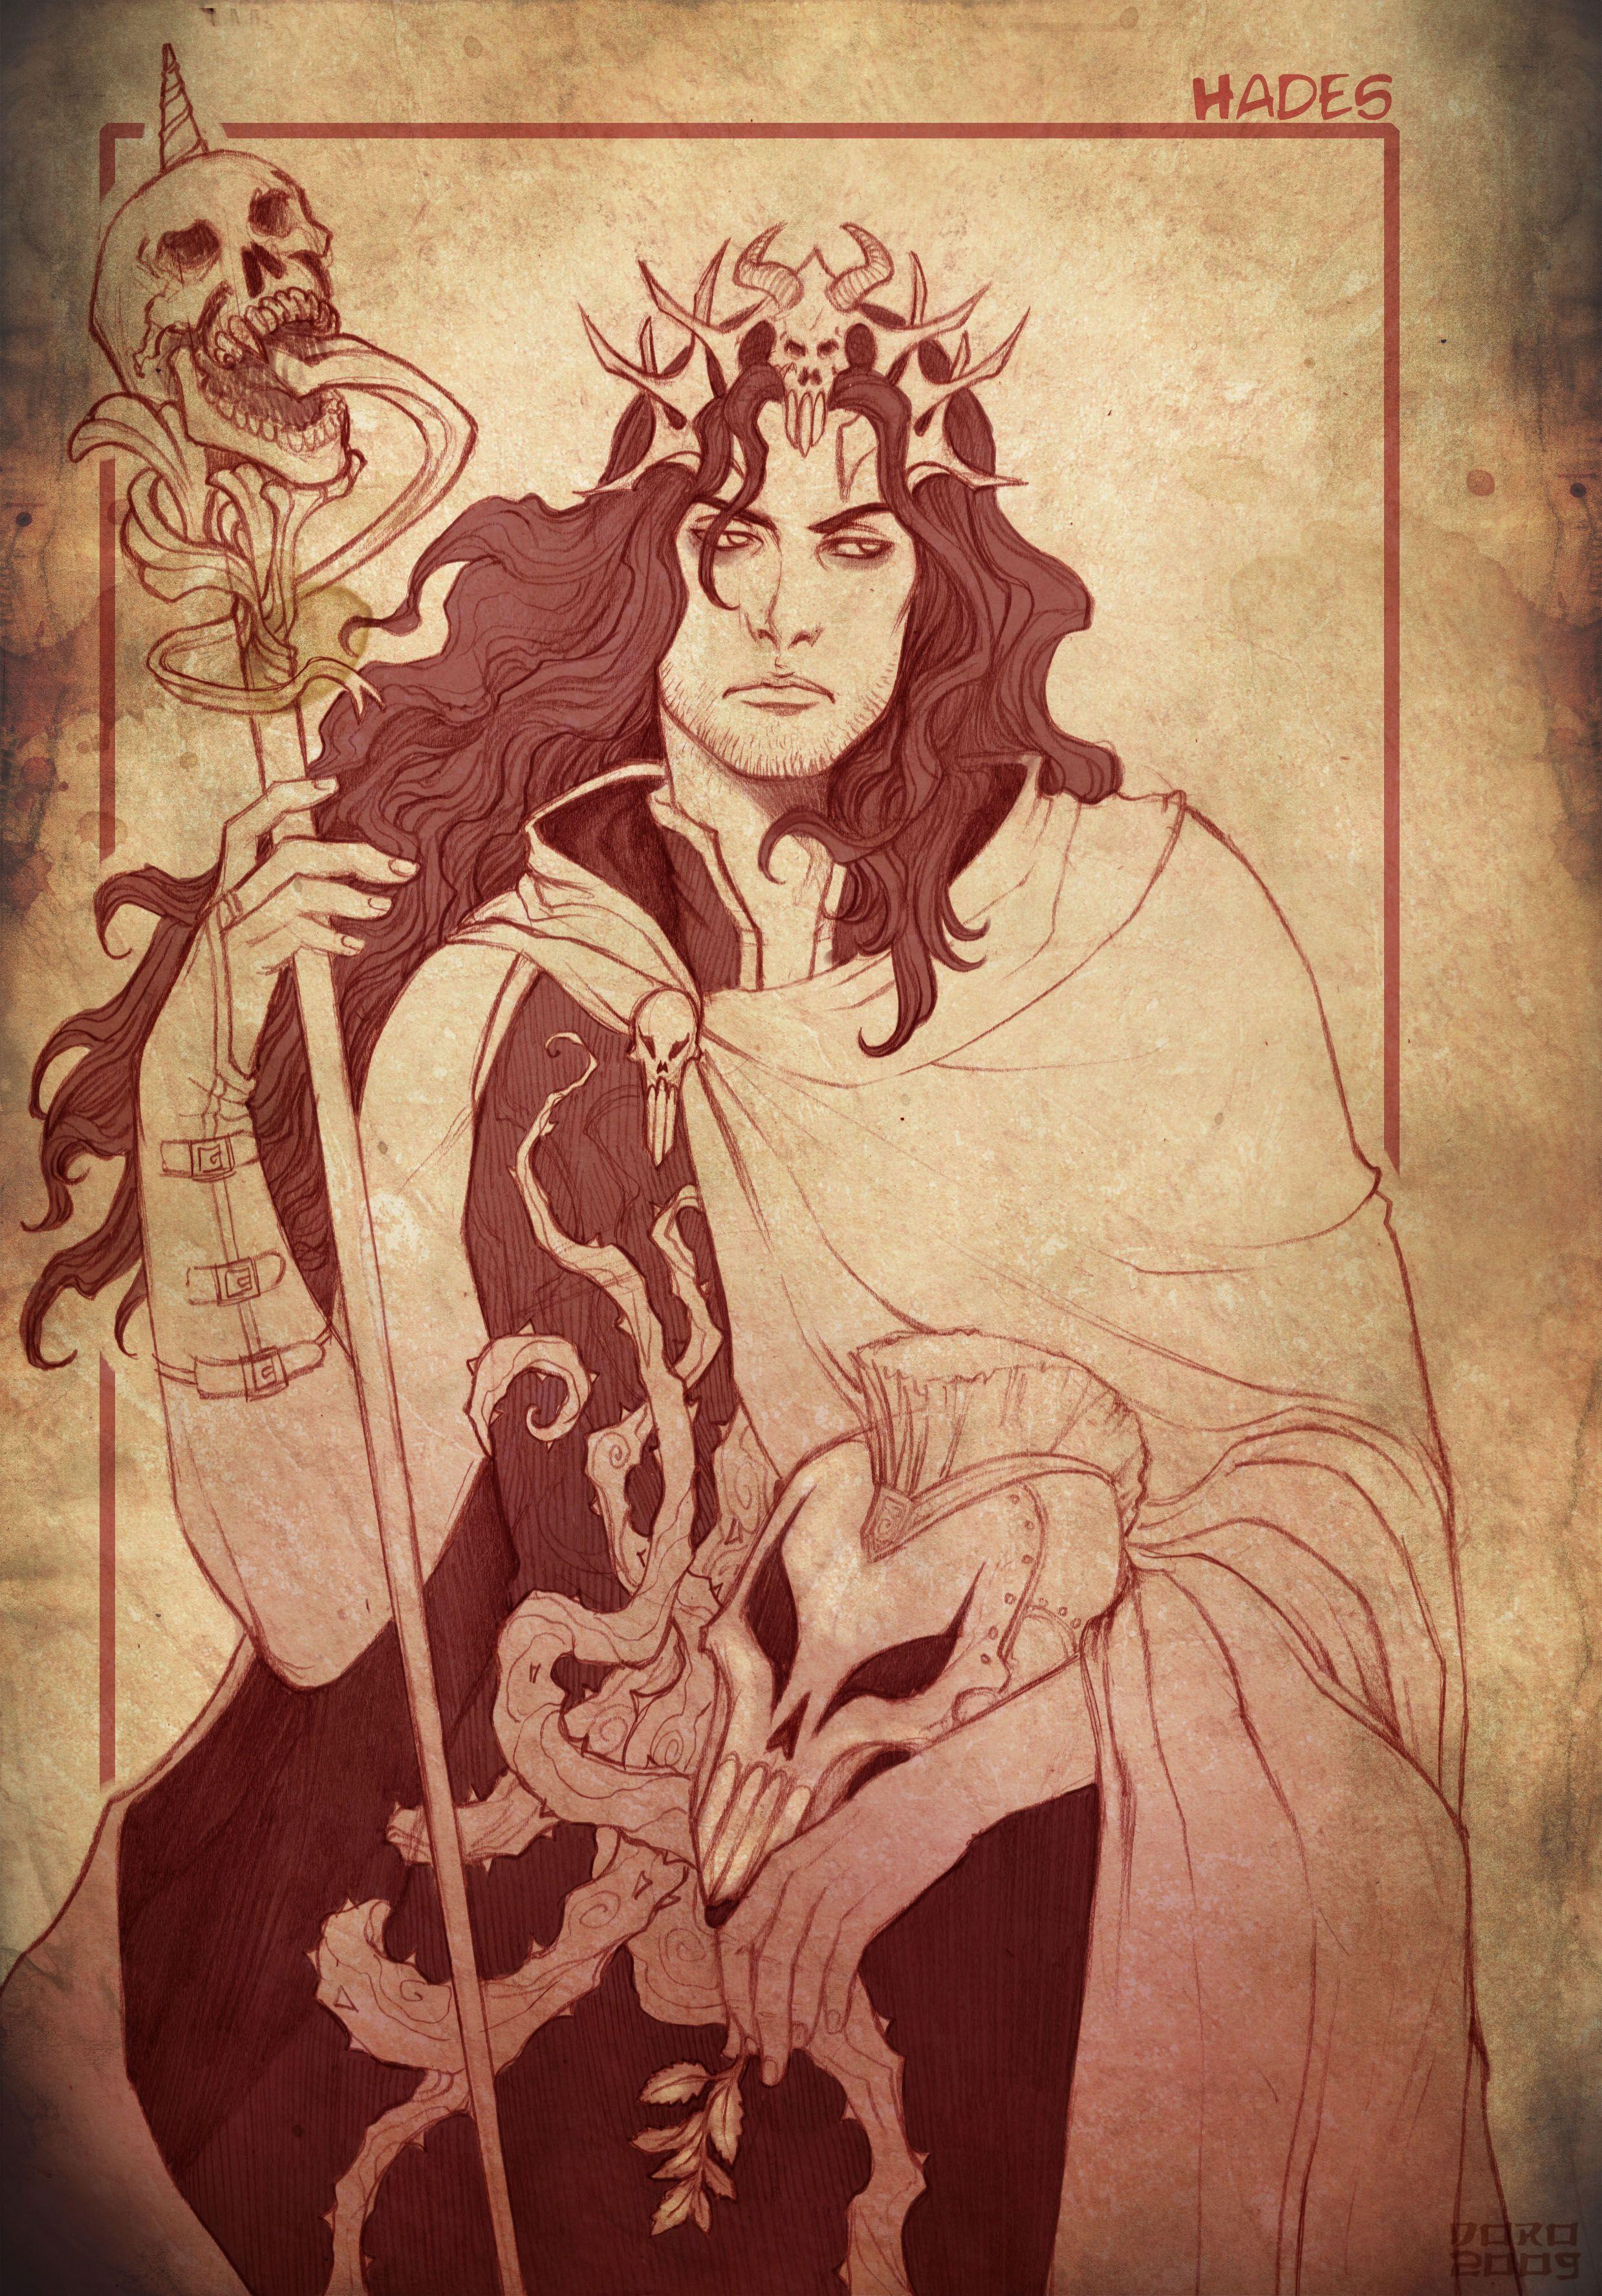 hades god of death u0026 underworld not an evil god mistaken to